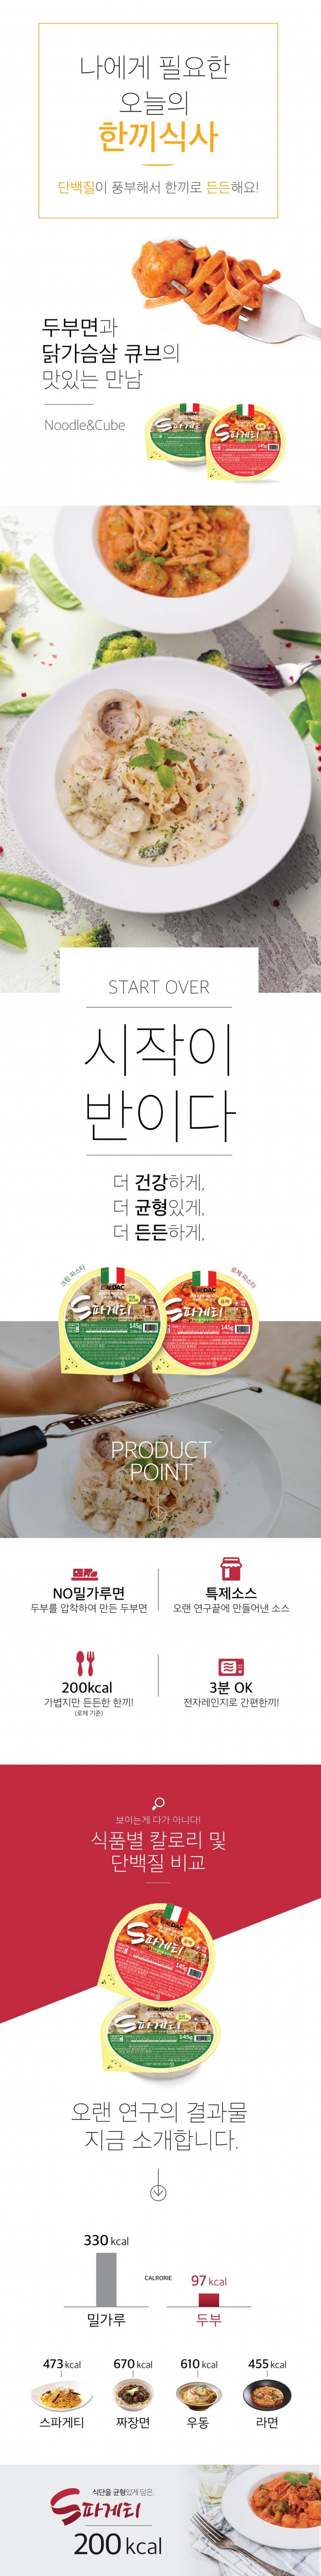 S파게티 까르보나라 체험단 모집 (04.15~04.25)